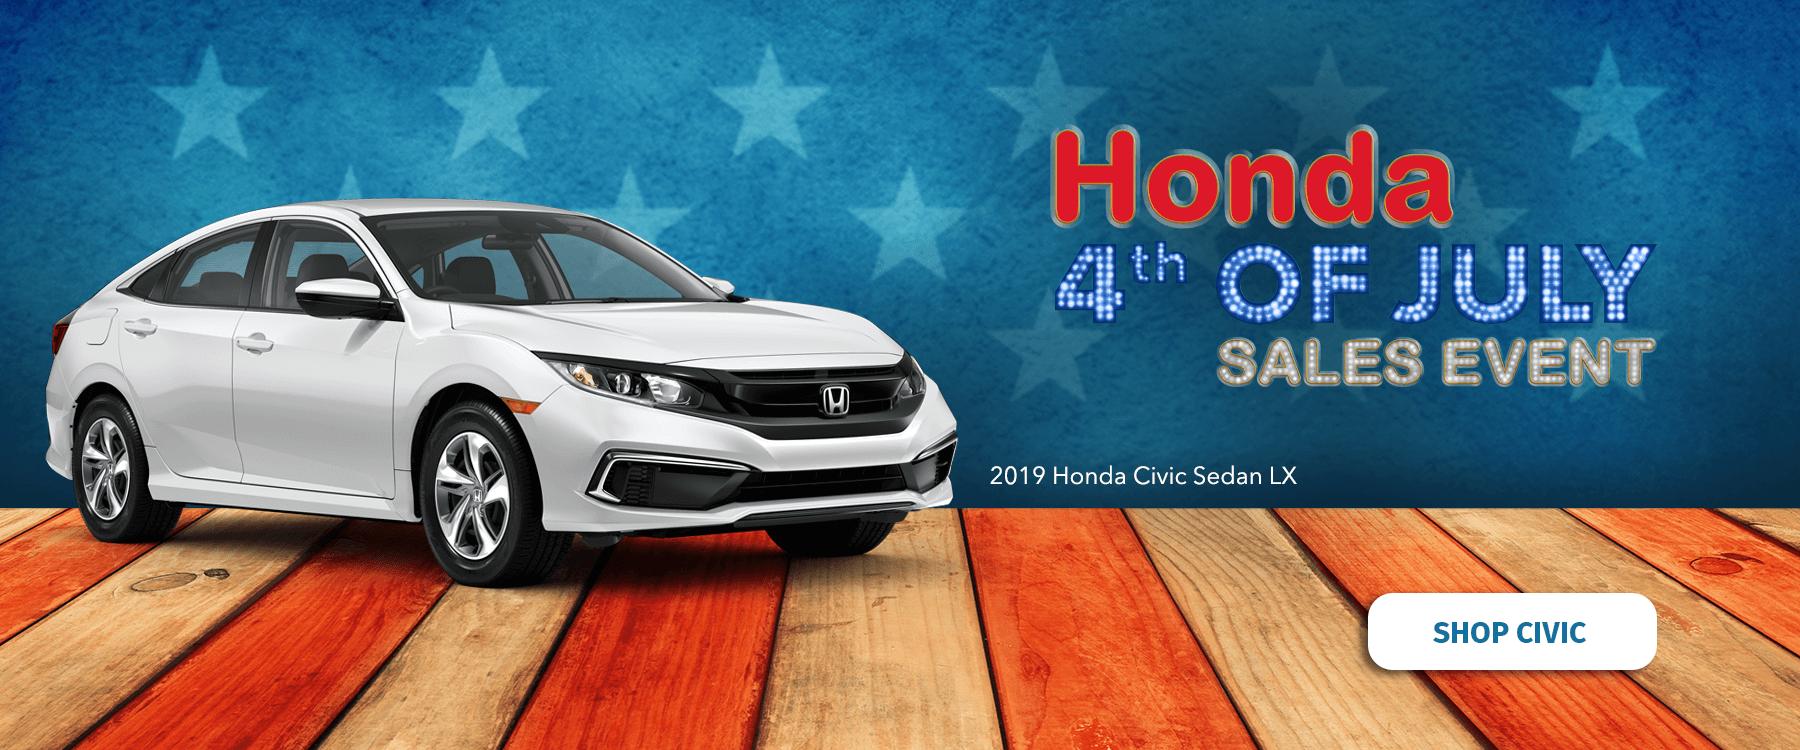 Honda 4th of July Sales Event 2019 Civic Sedan Slider